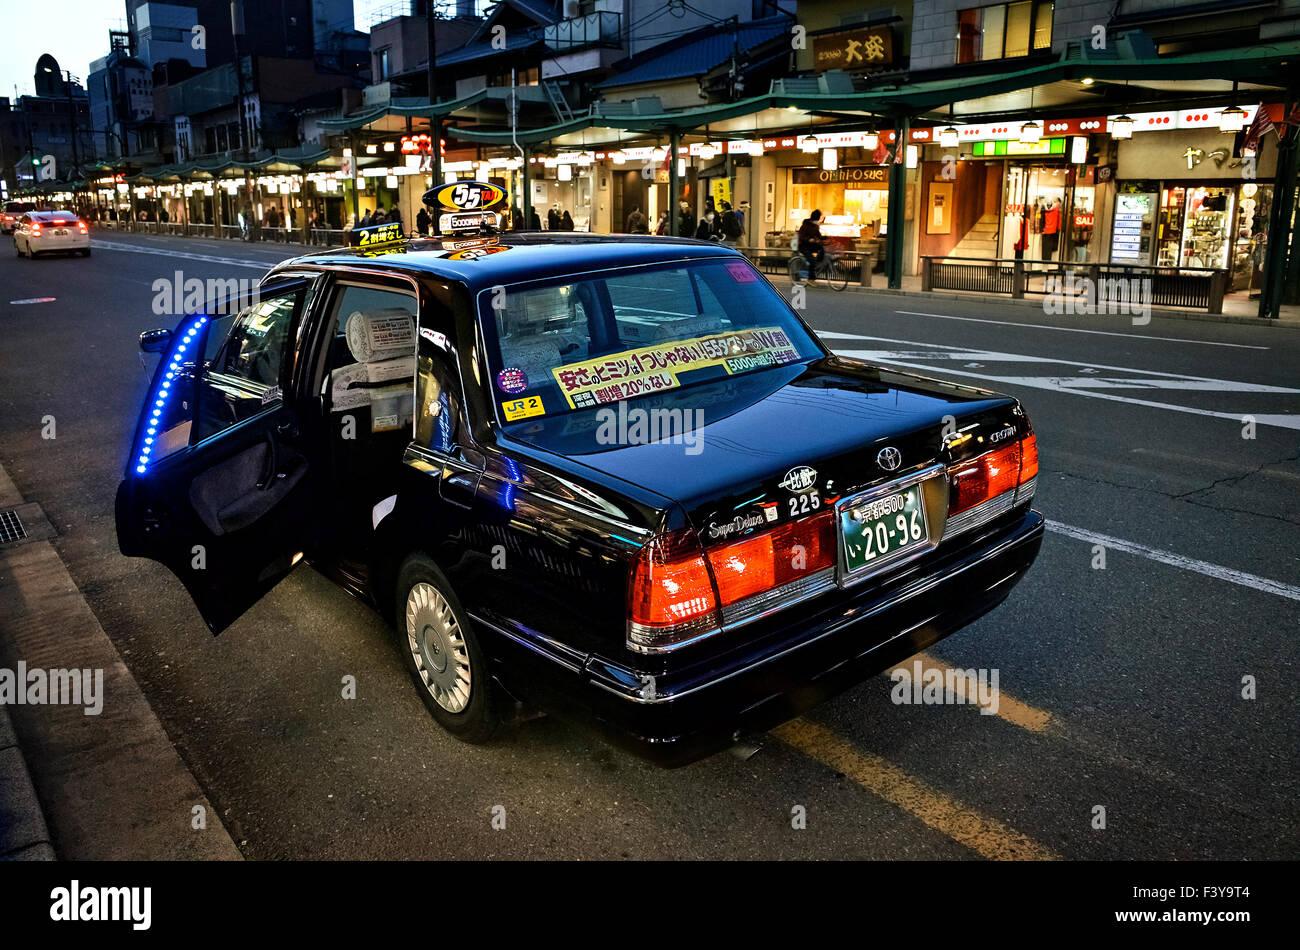 Japan, Honshu island, Kansai, Kyoto, taxi waiting in Gion district. - Stock Image